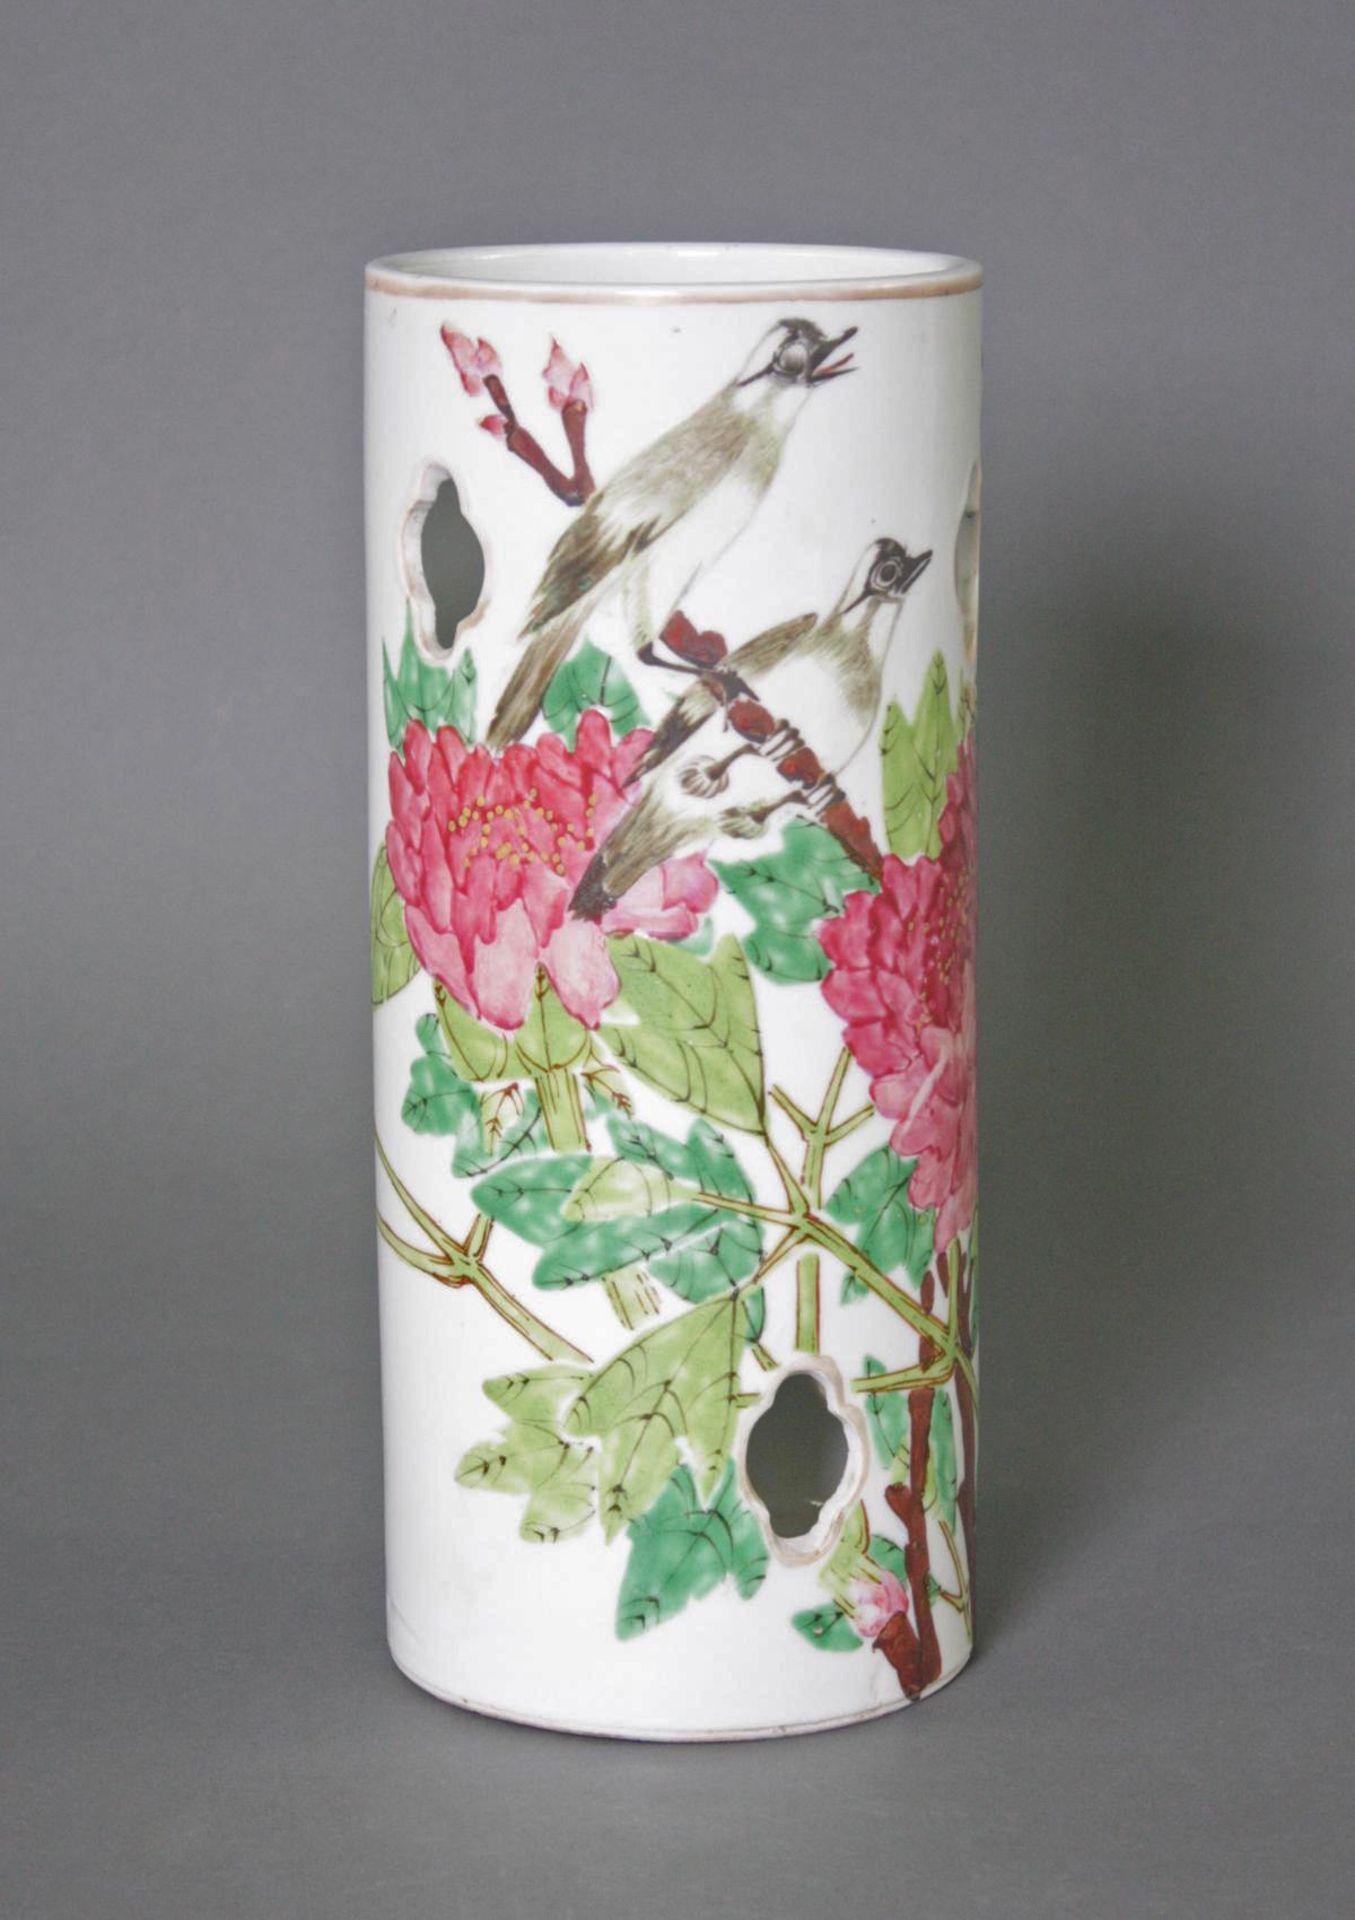 Hutständer, China Ende 19. Jahrhundert - Bild 2 aus 6